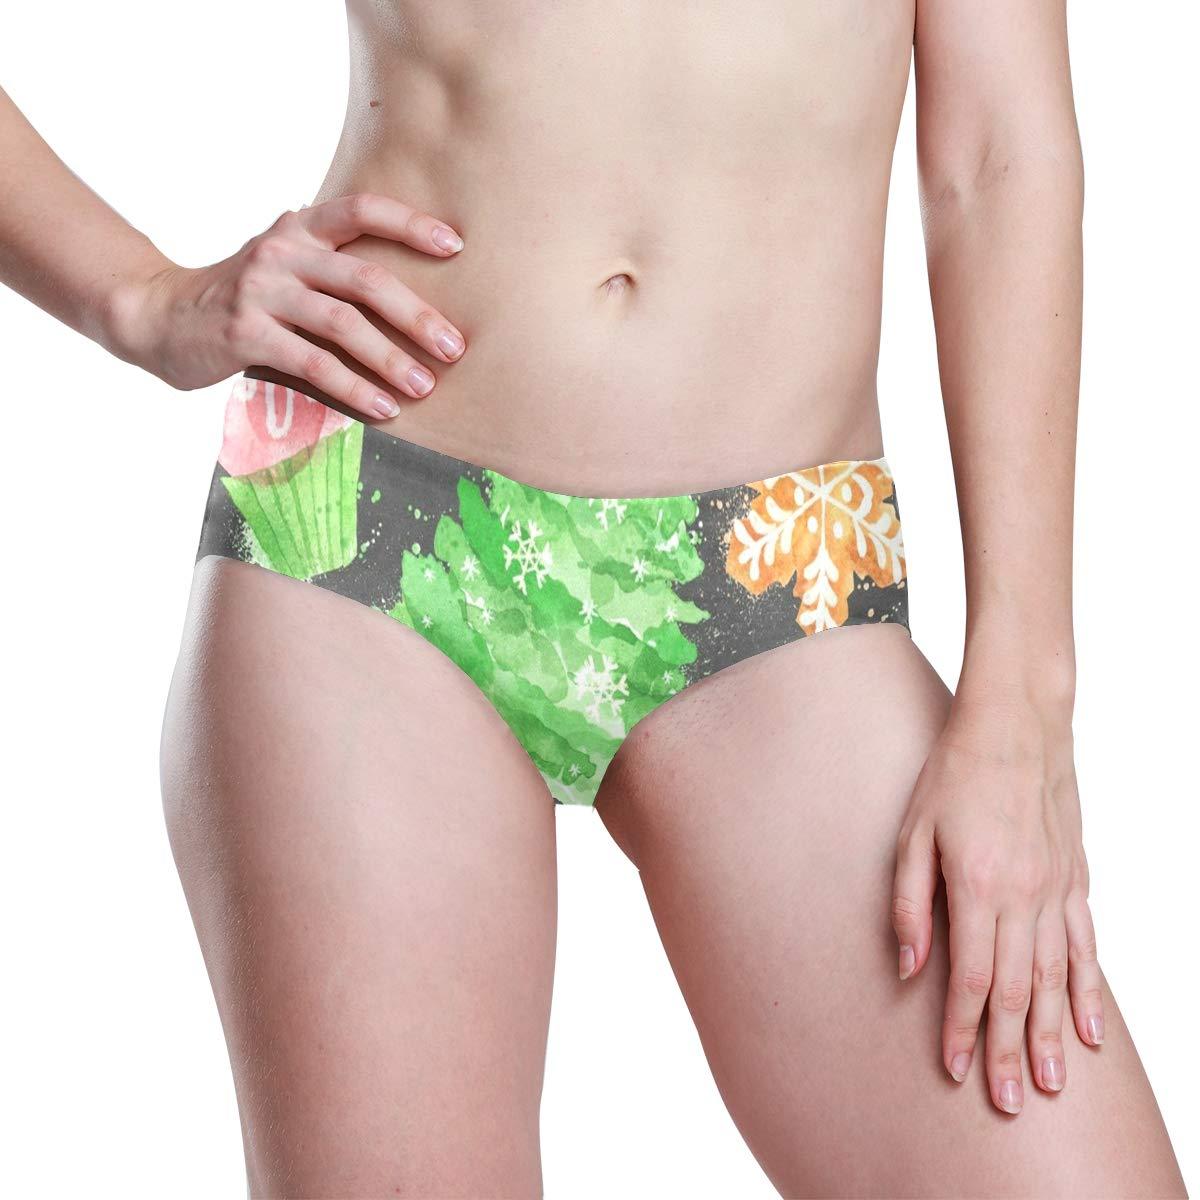 Watercolor Christmas Symbols Womens Invisibles Seamless No Show Panty Line Bikini Laies Panties